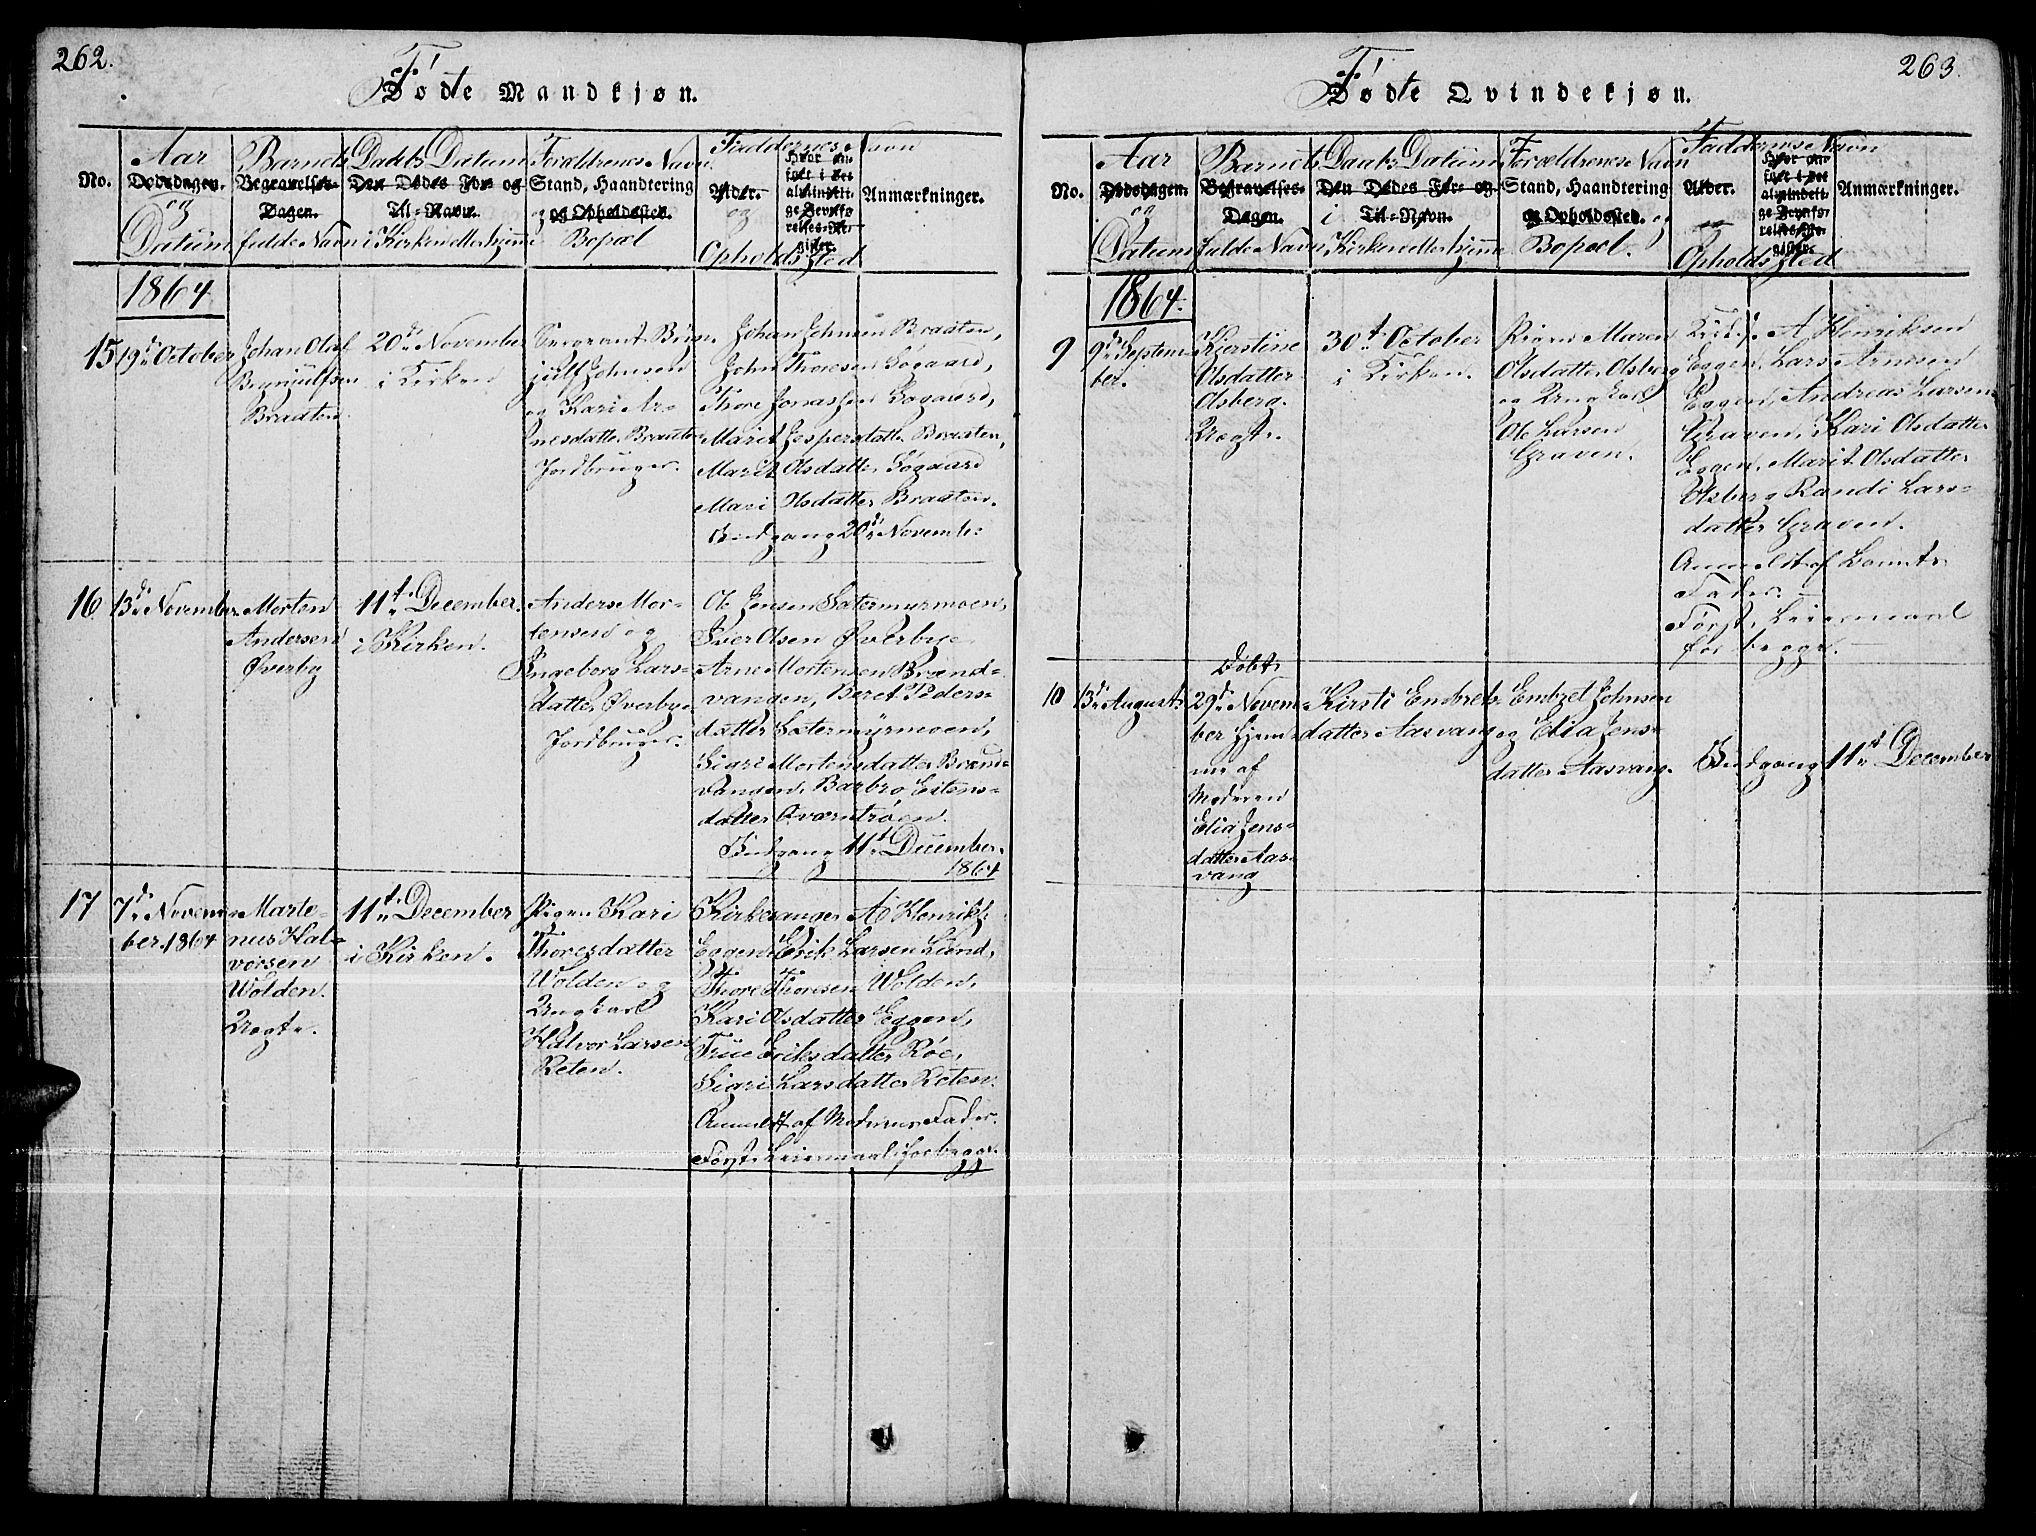 SAH, Tynset prestekontor, Klokkerbok nr. 4, 1814-1879, s. 262-263